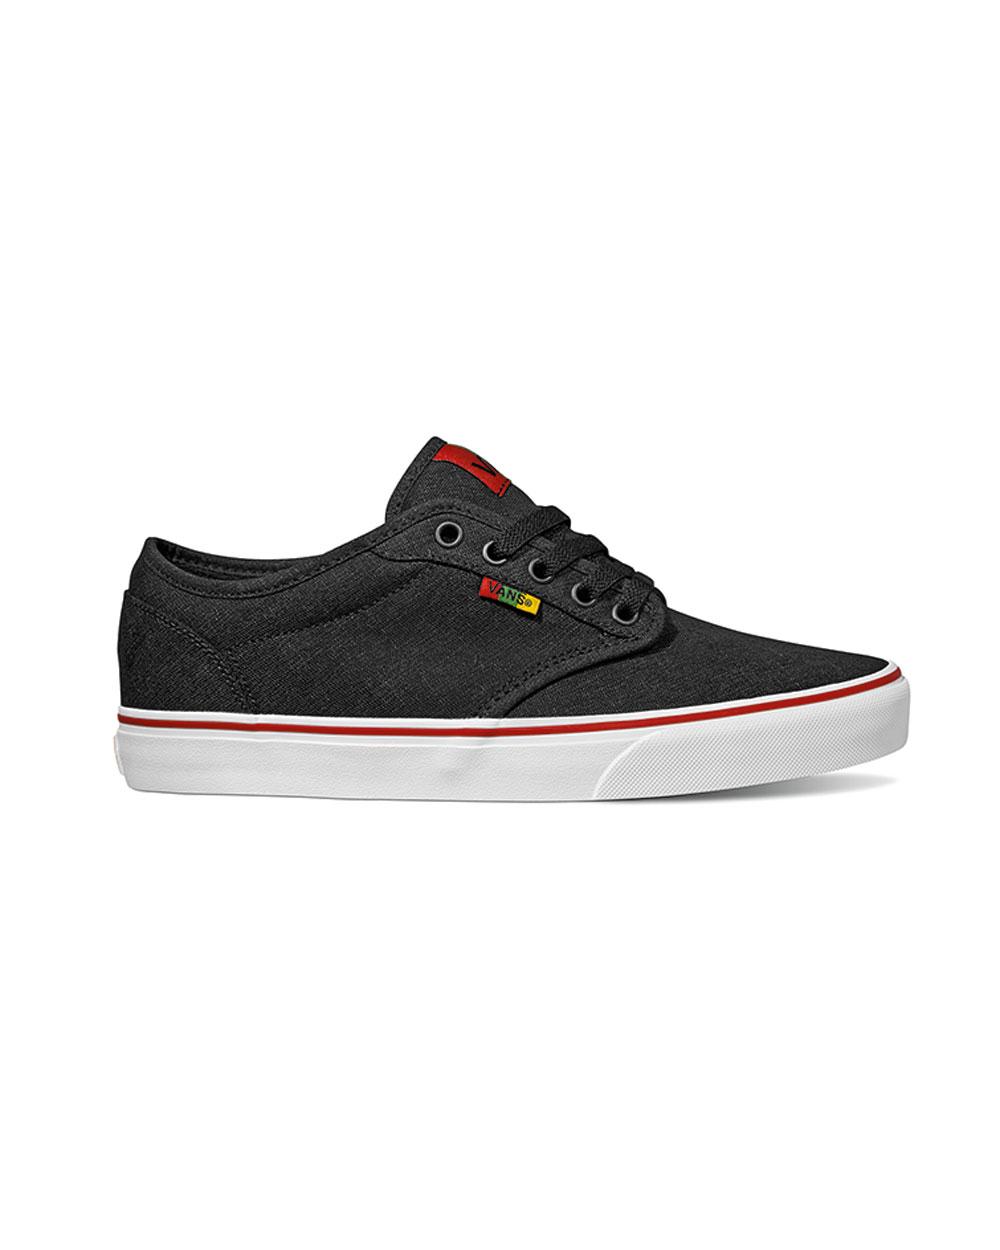 Vans Atwood Rasta (black/red)